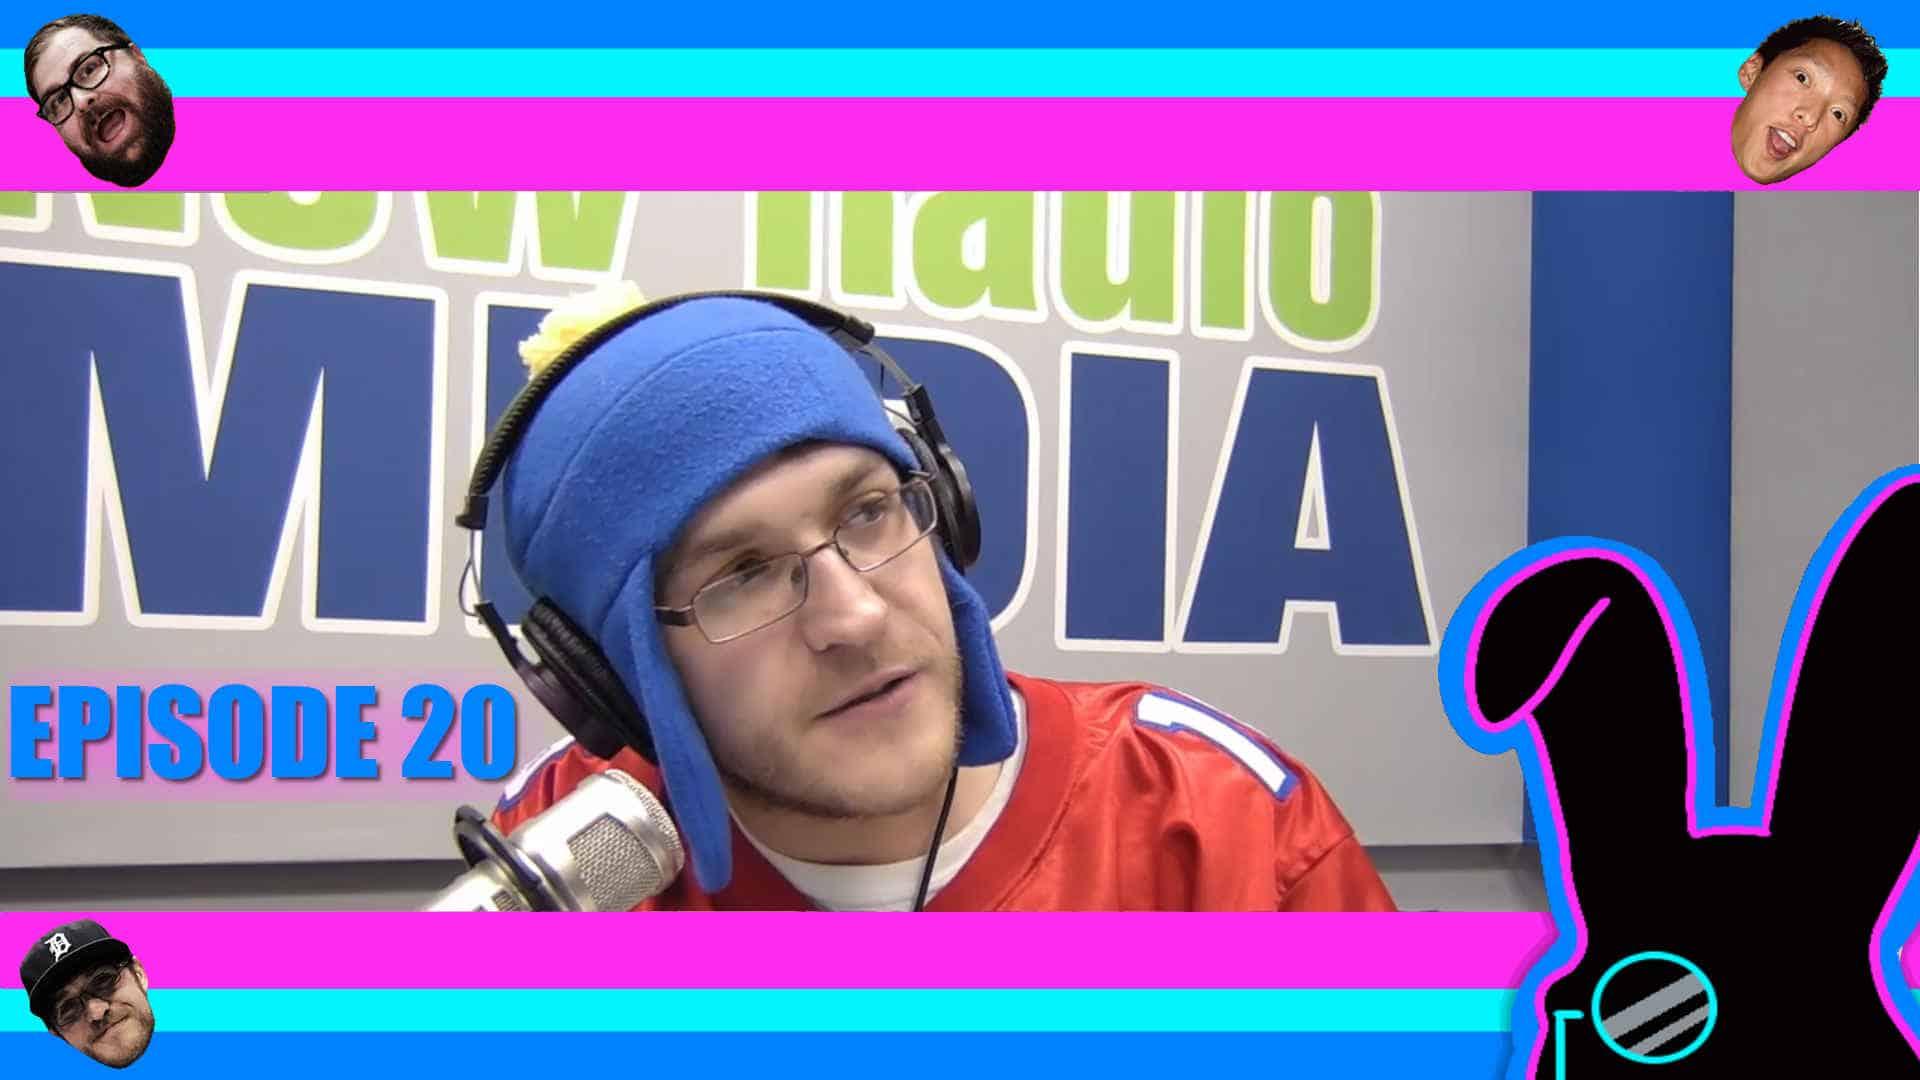 Geektainment Weekly - Episode 20